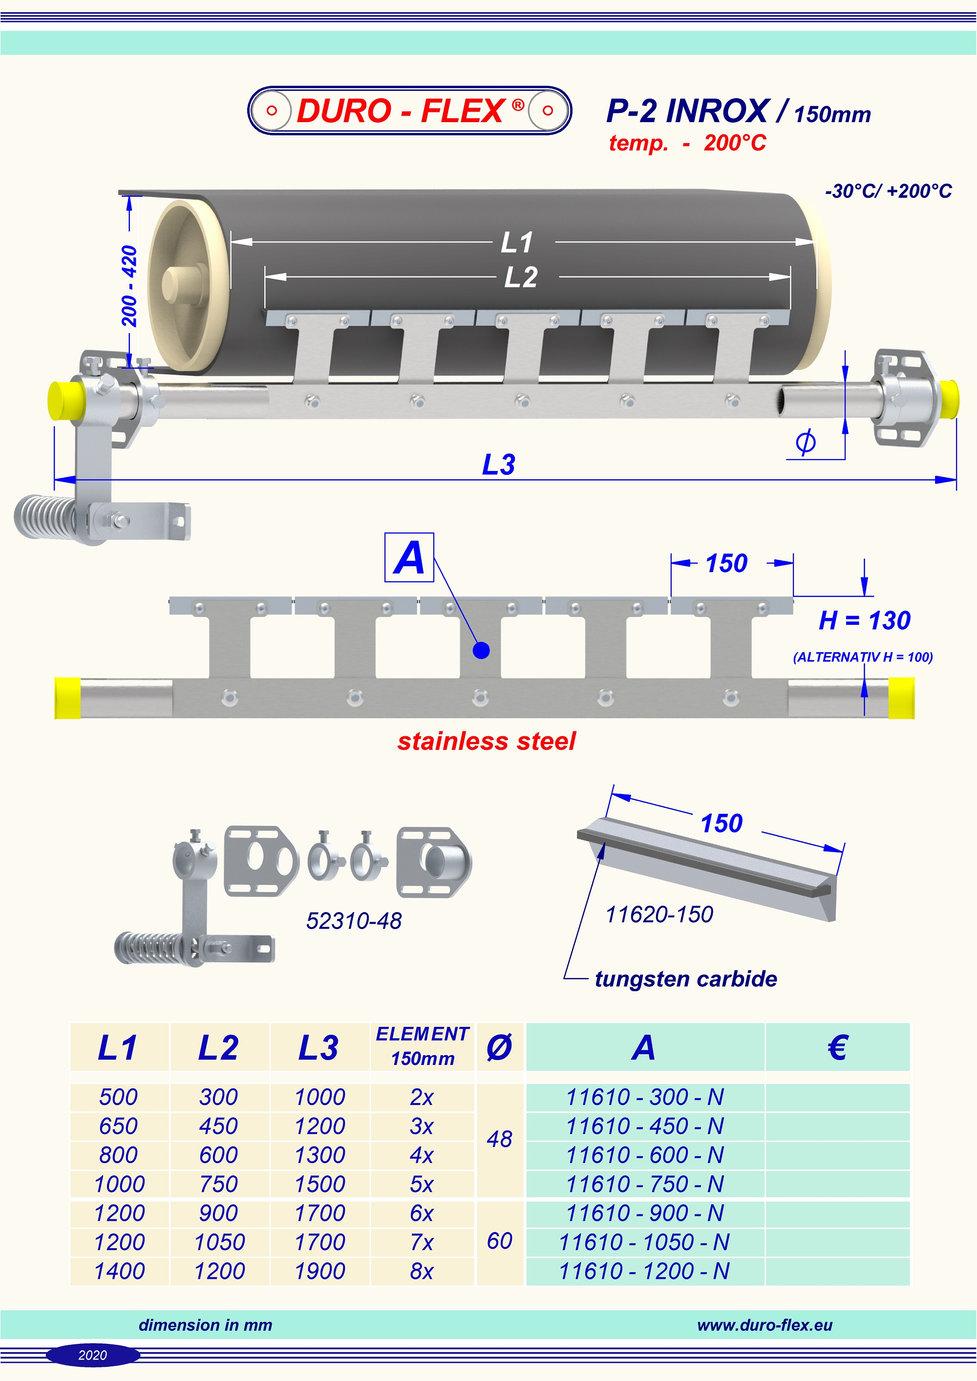 Typenliste P-2 INROX_150_S1.jpg